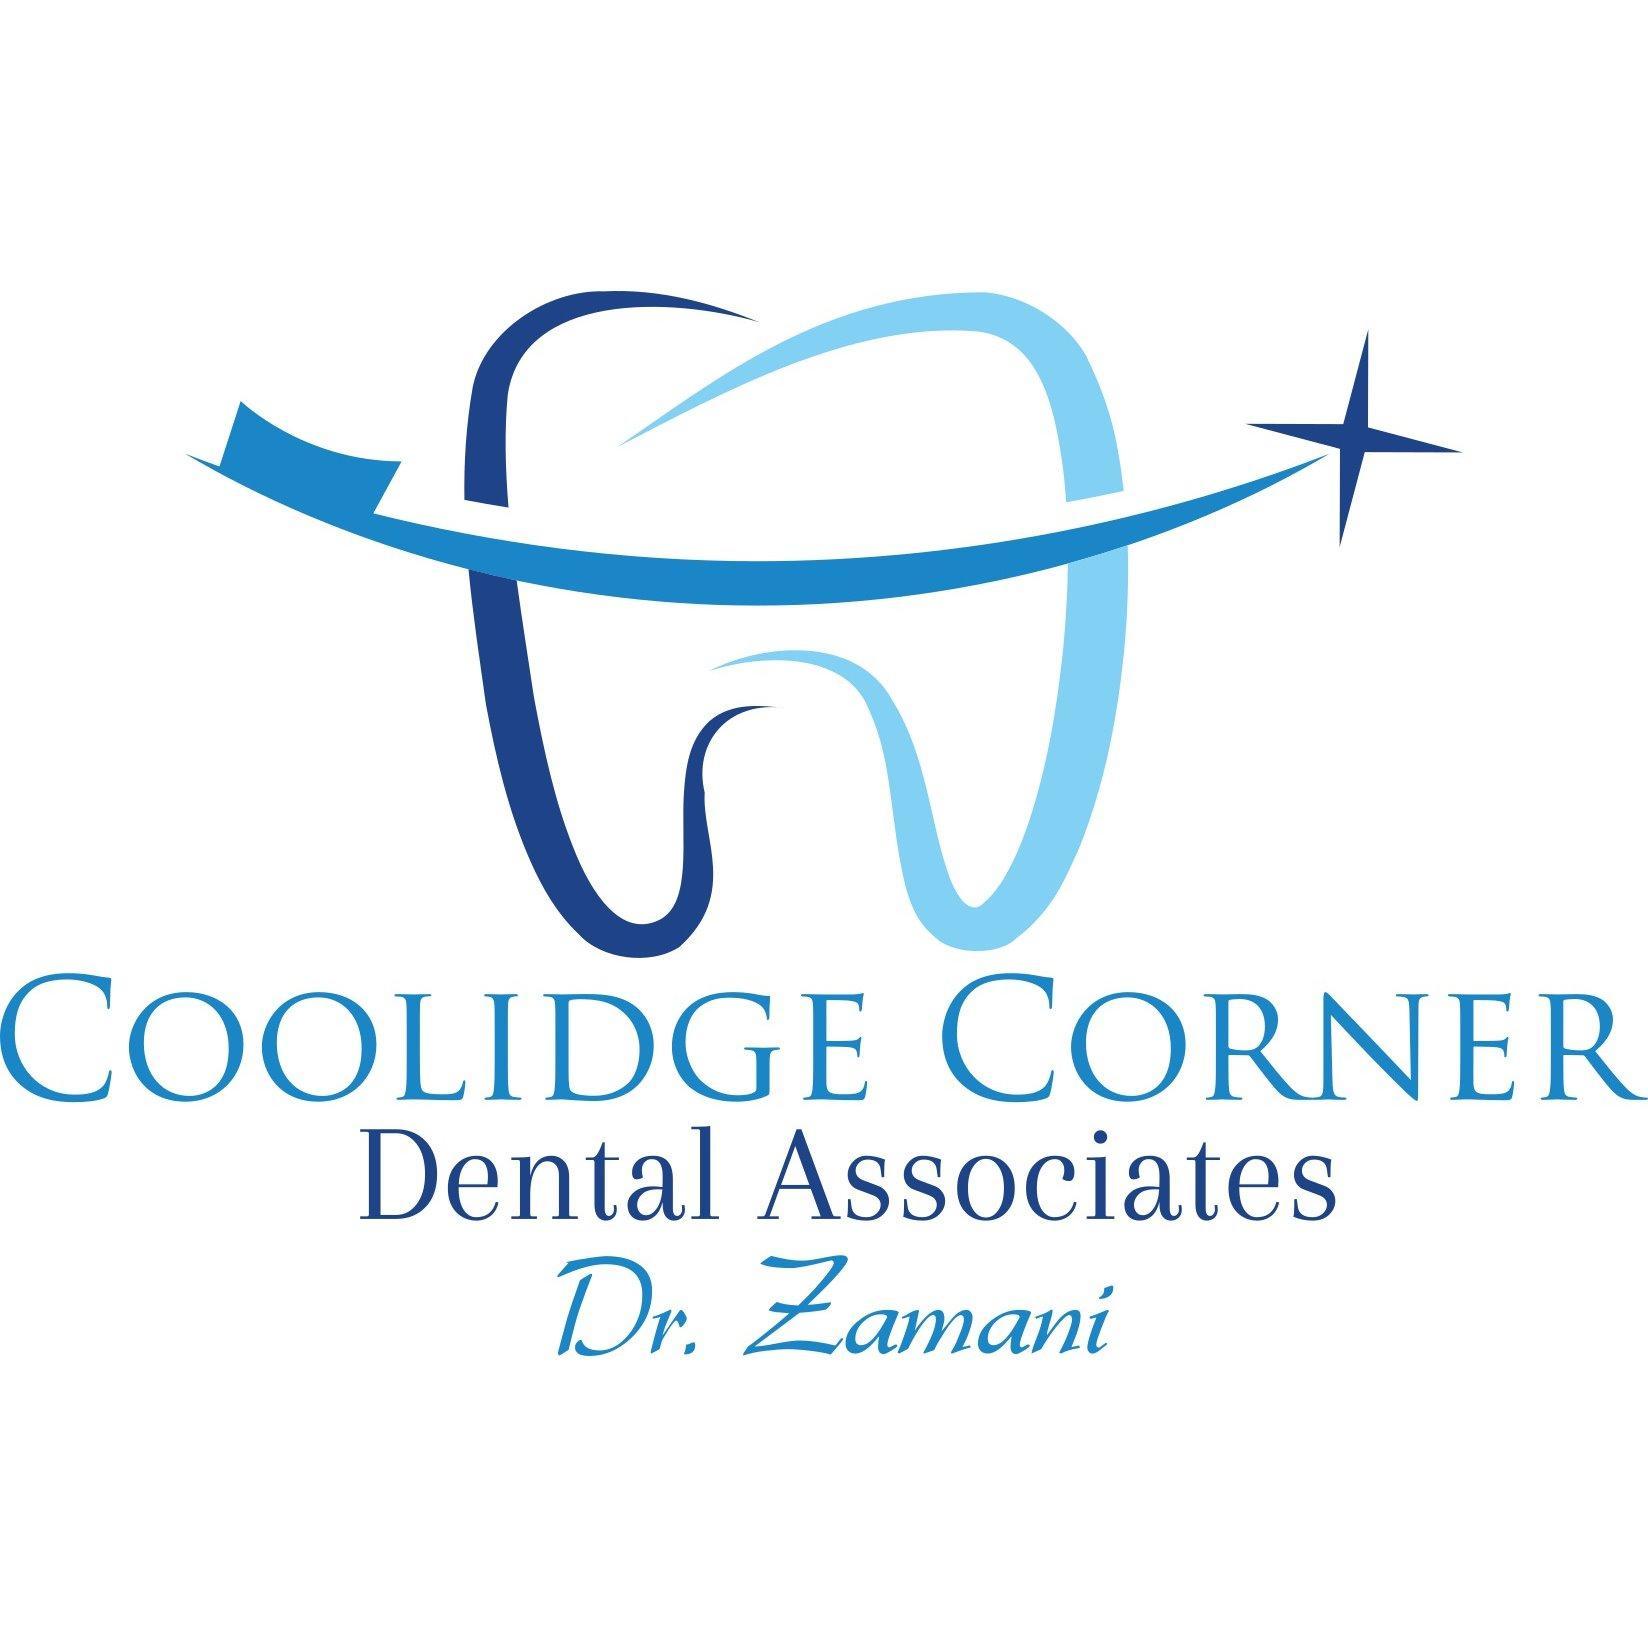 Coolidge Corner Dental Associates - Faridoon Zamani DDS